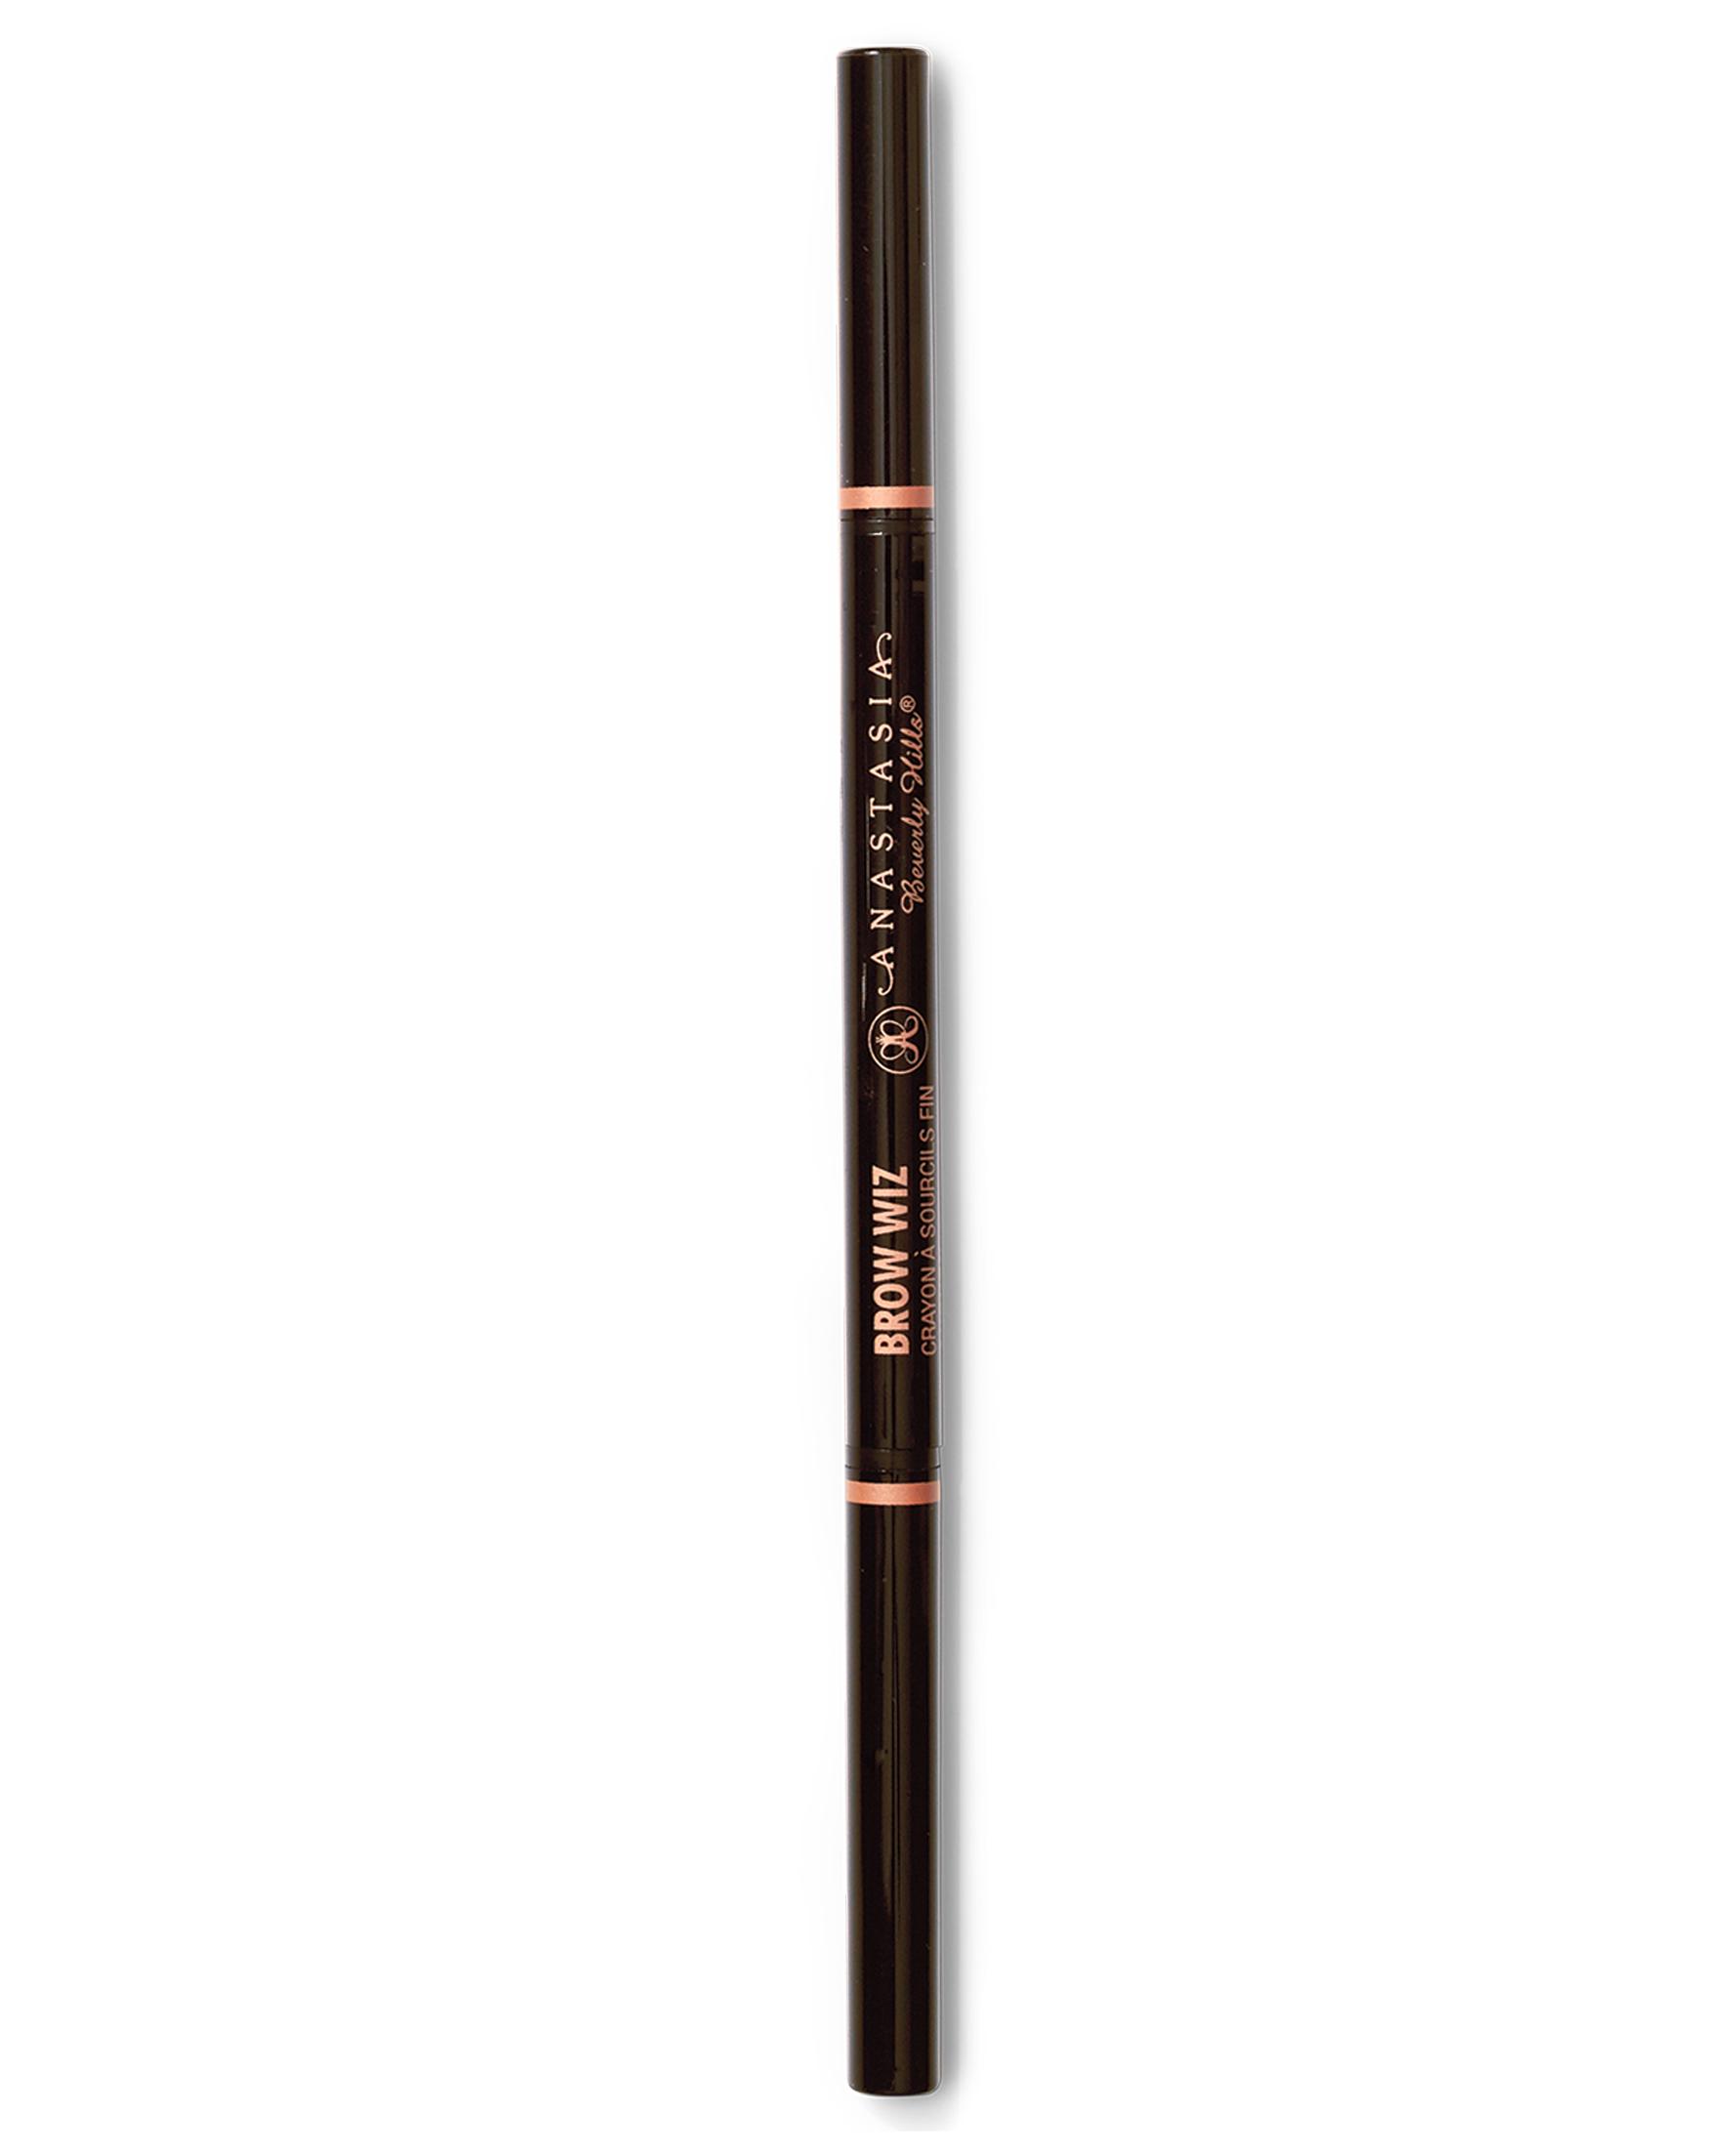 brow-pencil-2-124-d111715.jpg